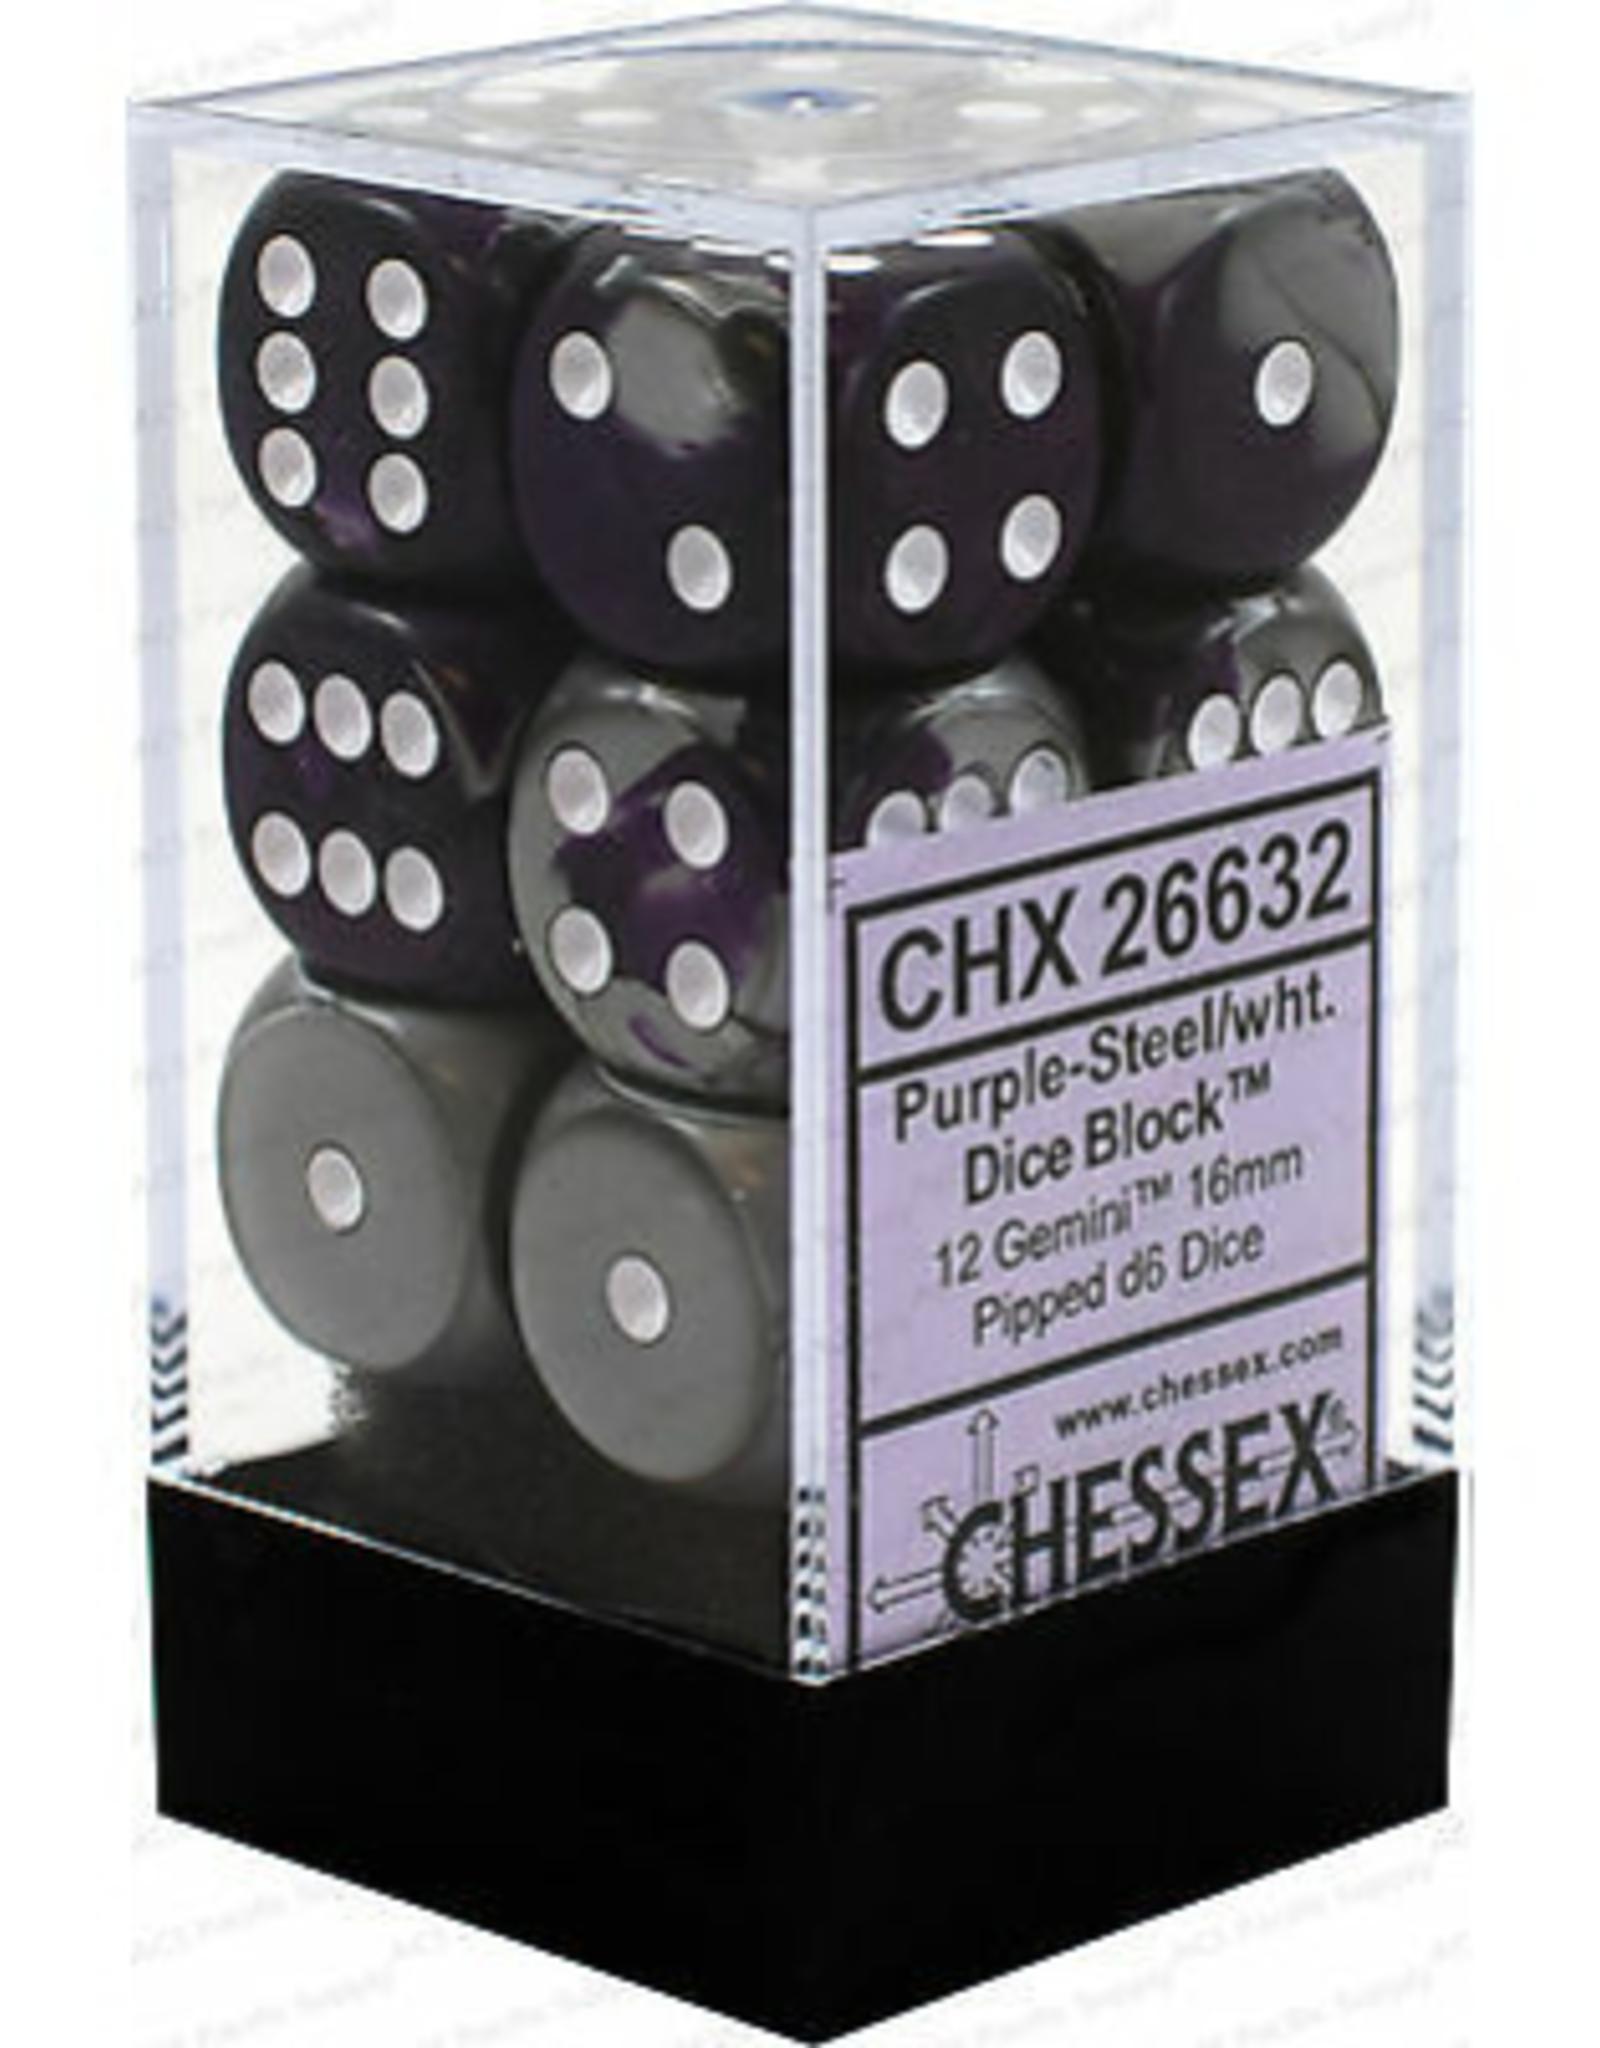 Chessex 12 Purple-Steel w/white Gemini 16mm d6 Dice Block - CHX26632